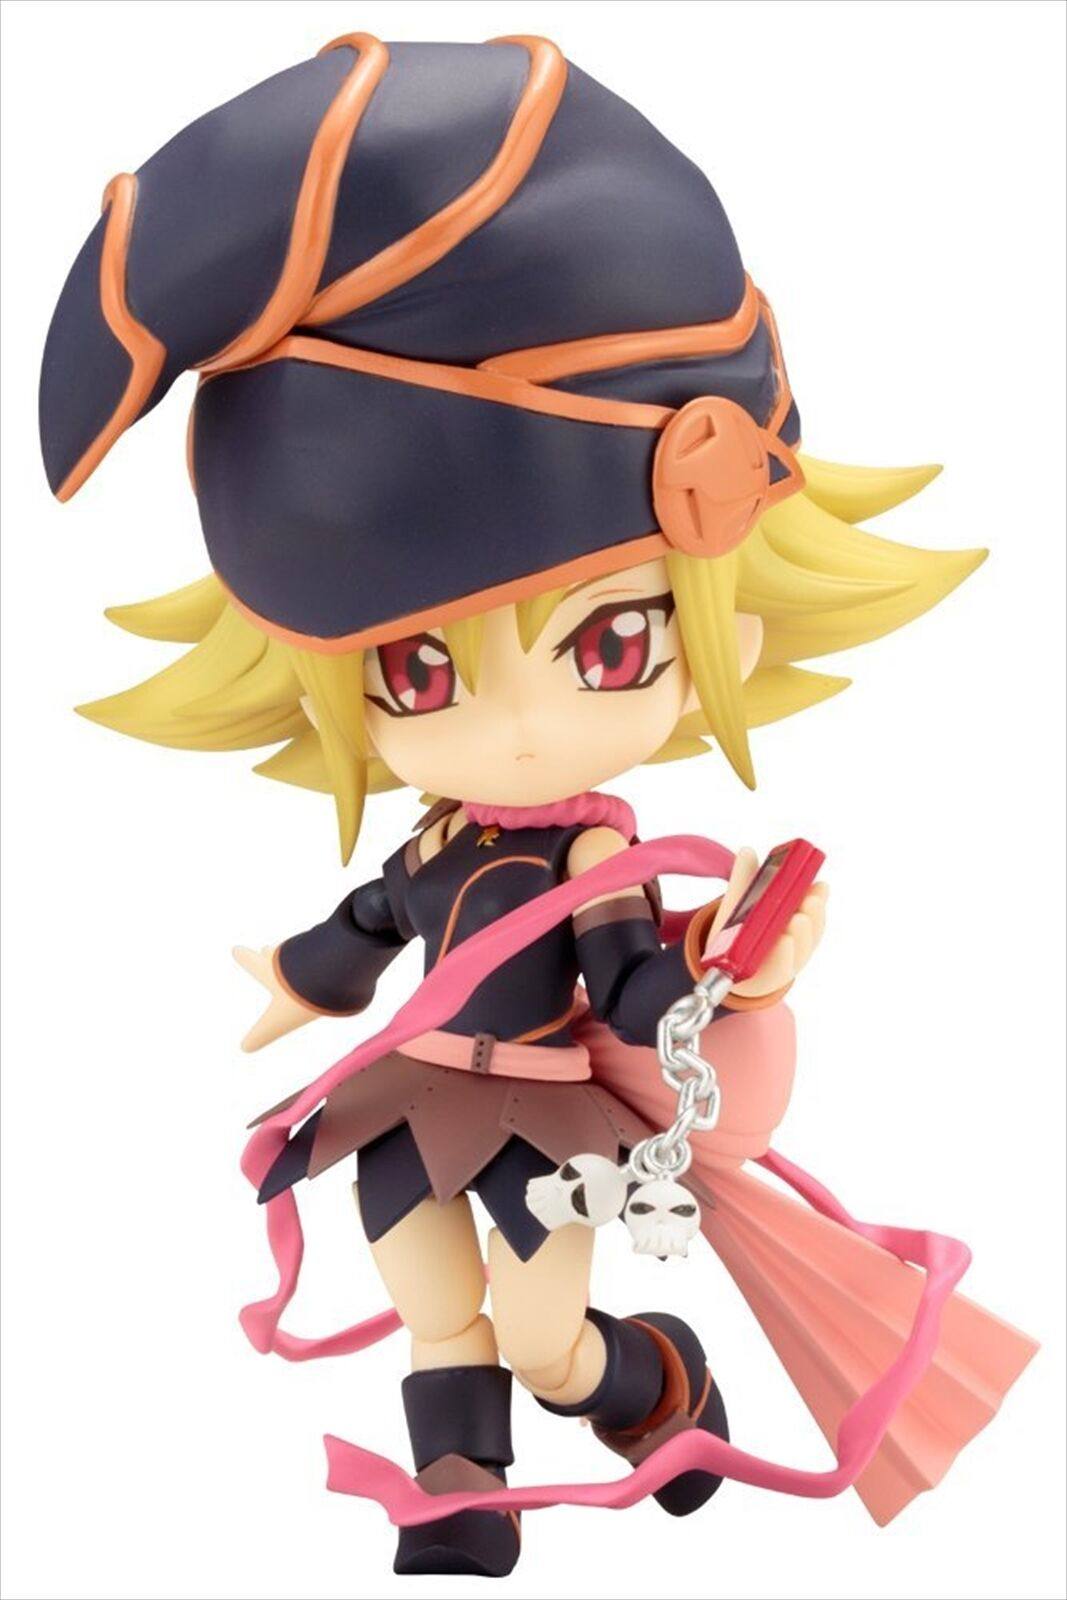 Kotobukiya Cu-poche Yu-Gi-Oh  ZEXAL Gagaga Girl Girl Girl PVC Action Figure 8c7bed